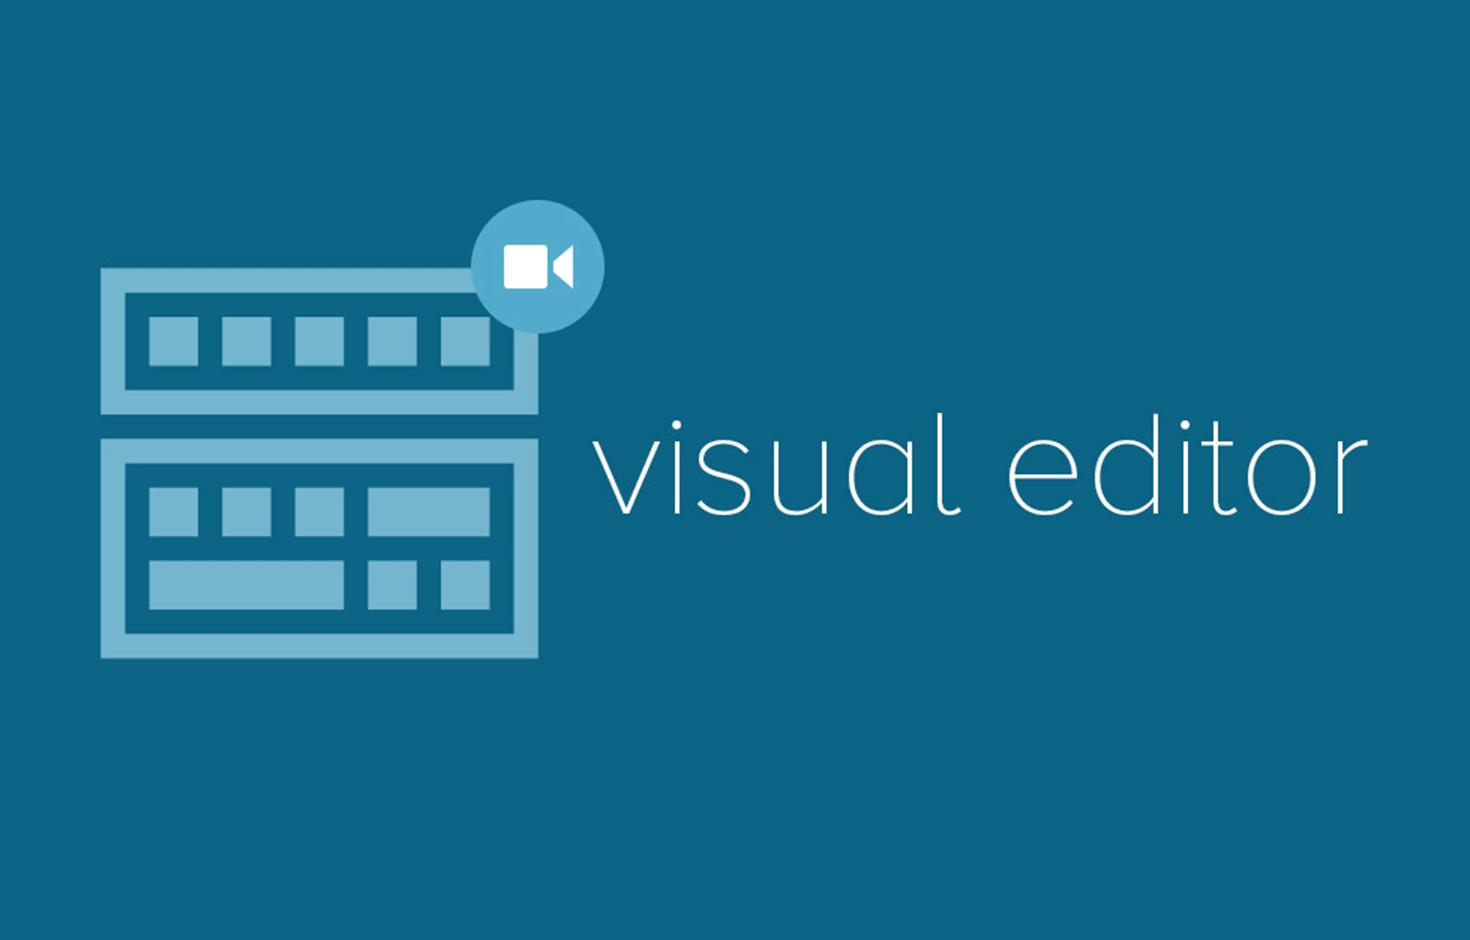 visual-editor-thumb-1470x940